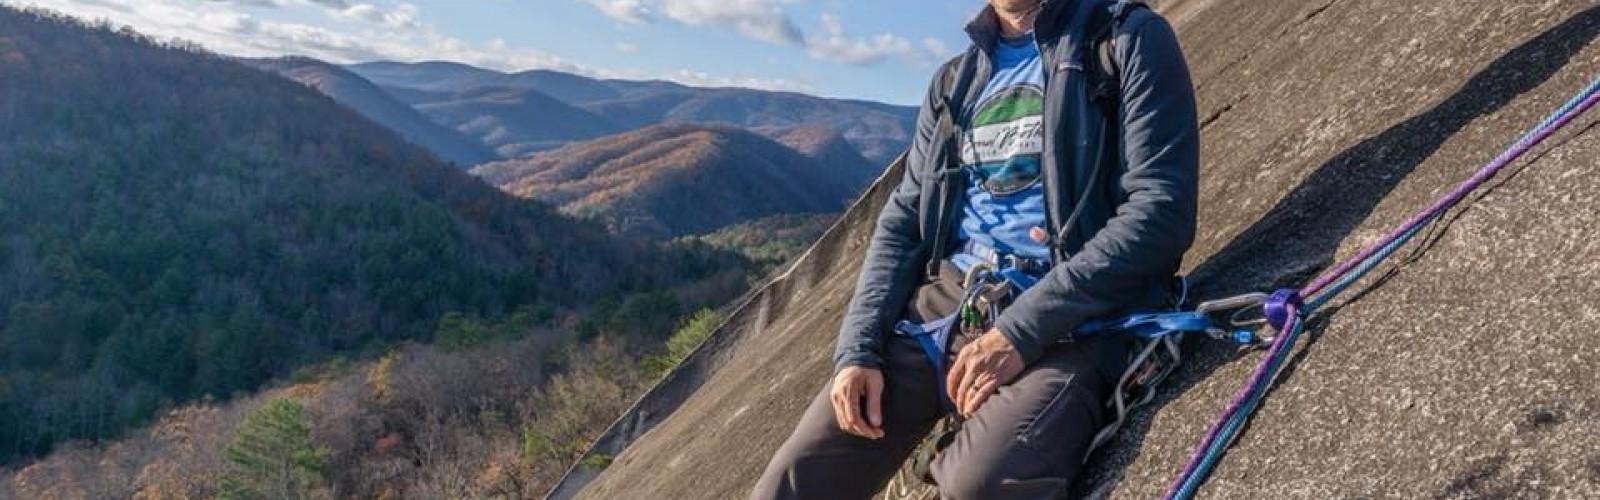 Blue Ridge Mountain Guides